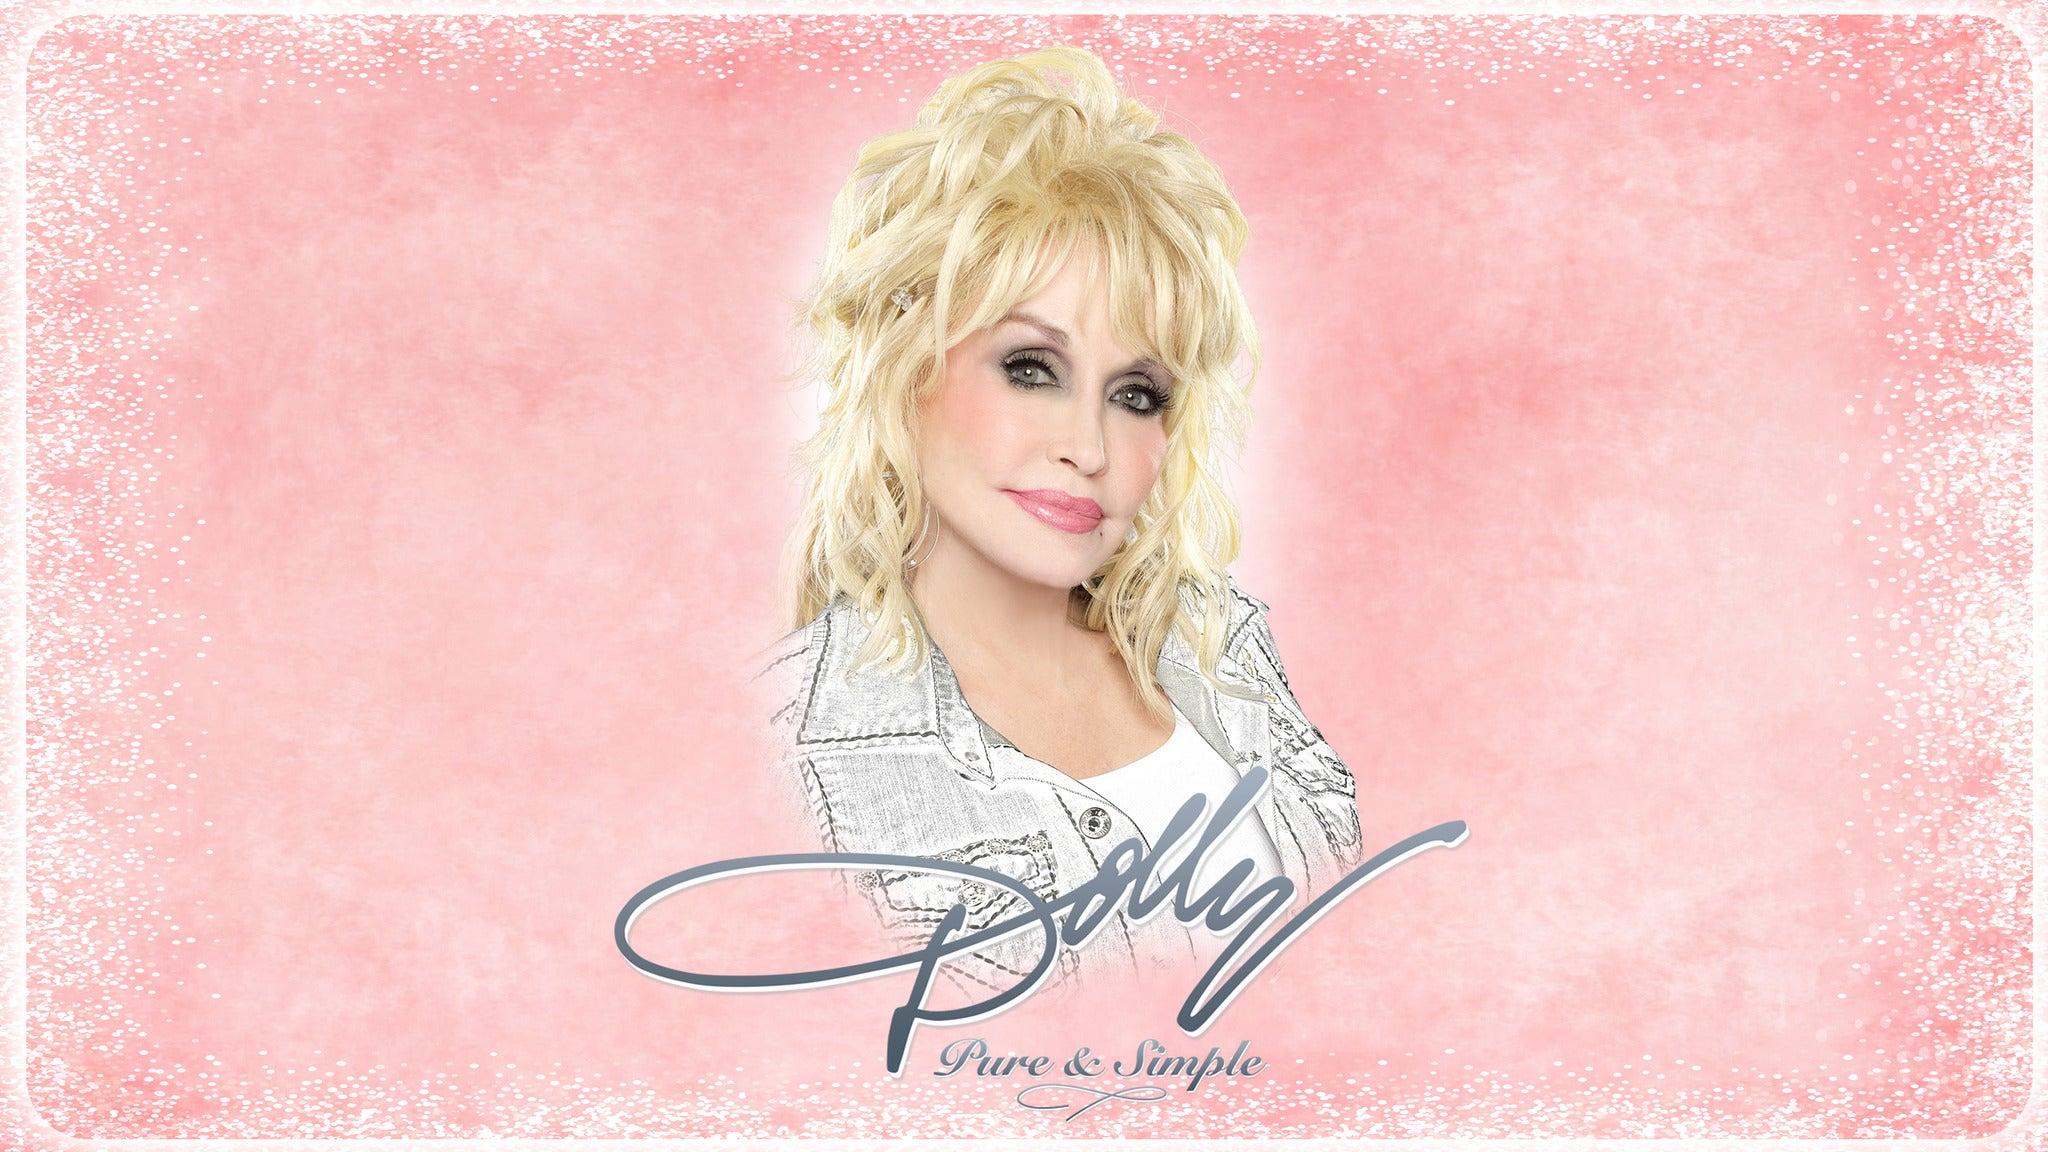 Dolly Parton Pure & Simple Tour